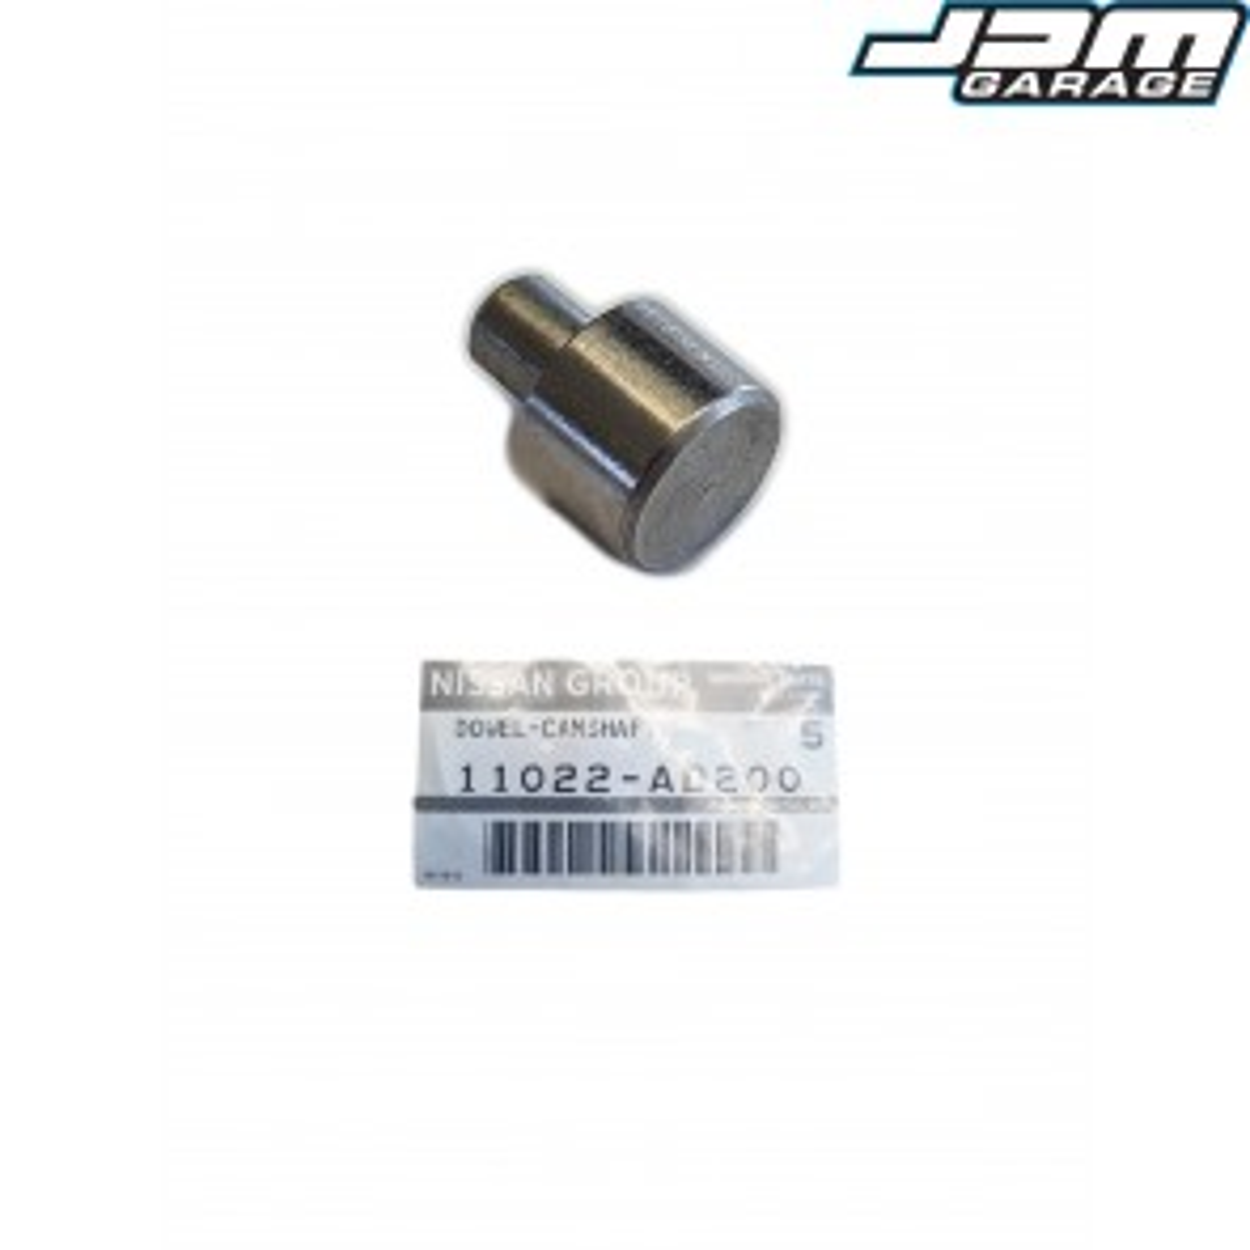 Genuine Nissan Flywheel Dowel Pin Fits R35 GT-R VR38DETT 350Z VQ35 370Z VQ37 11022-AD200